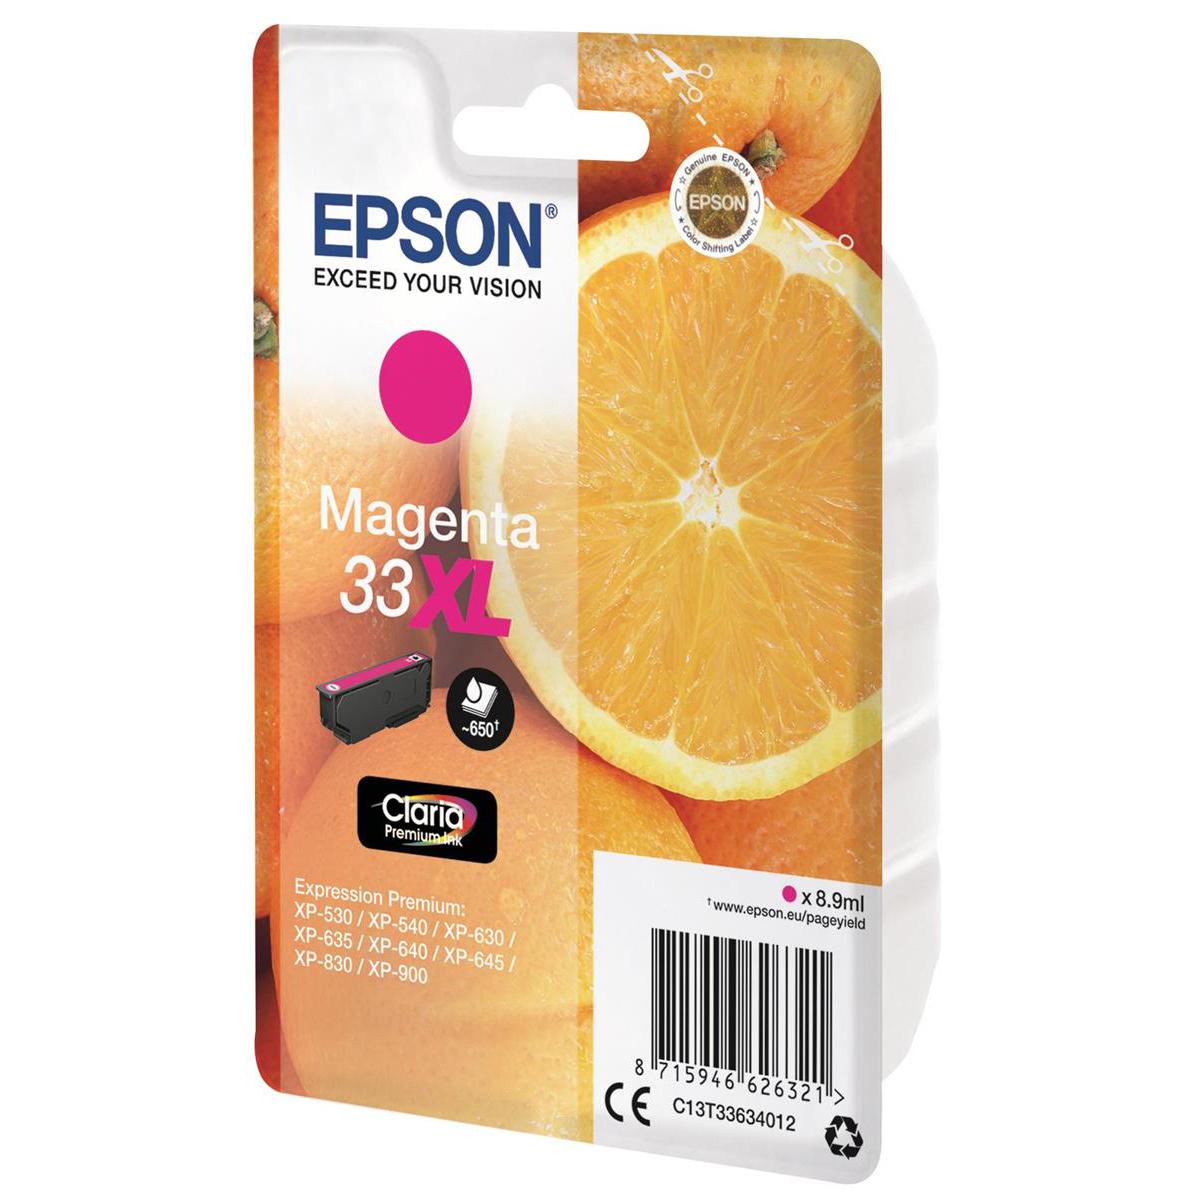 Epson T33XL Inkjet Cartridge Orange High Yield Page Life 650pp 8.9ml Magenta Ref C13T33634012